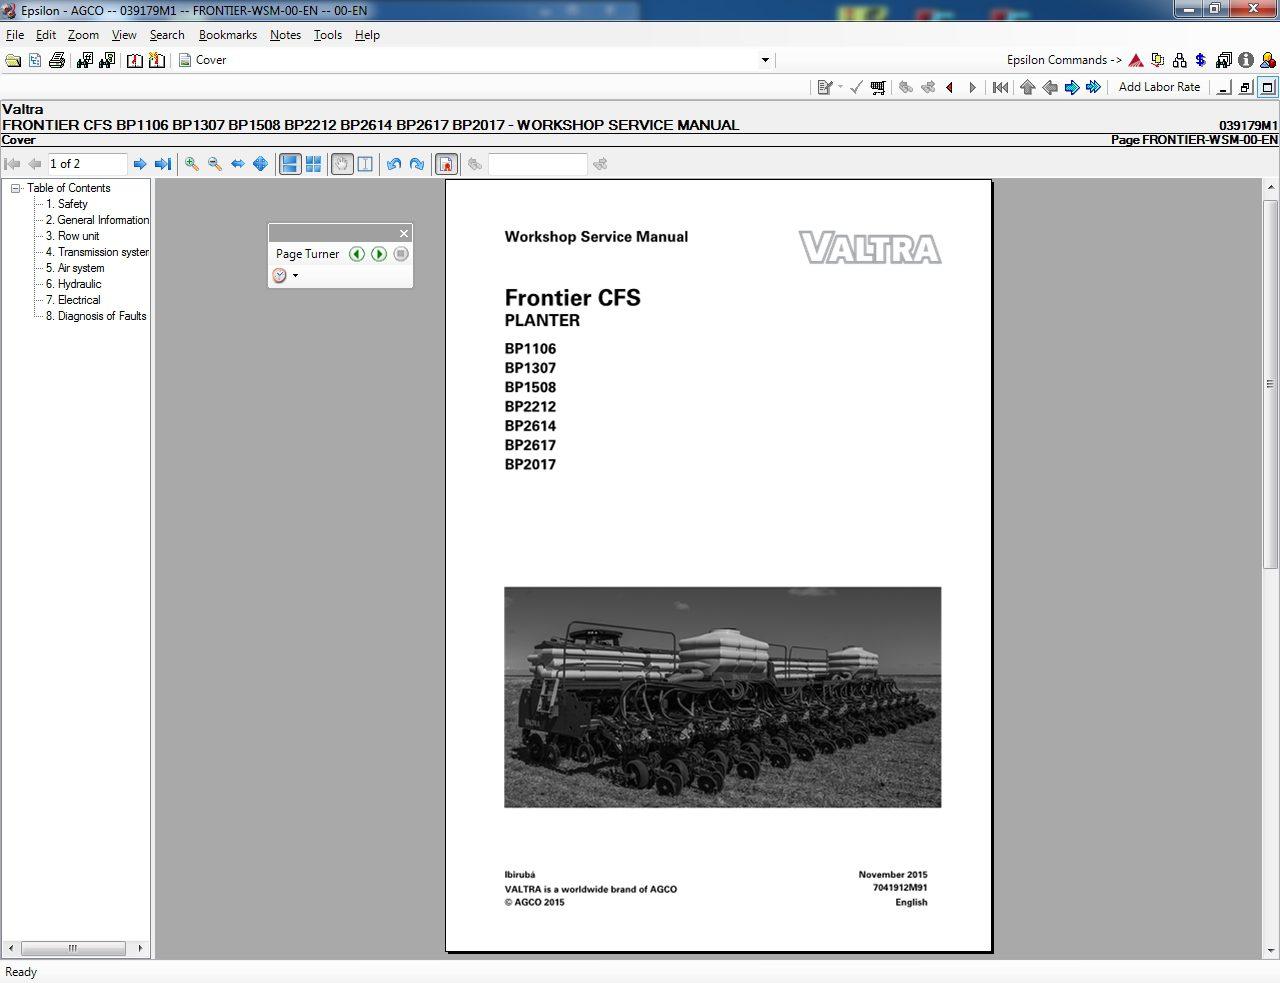 Valtra_SA_AG_South_America_112019_Part_Book_Workshop_Service_Manuals_5